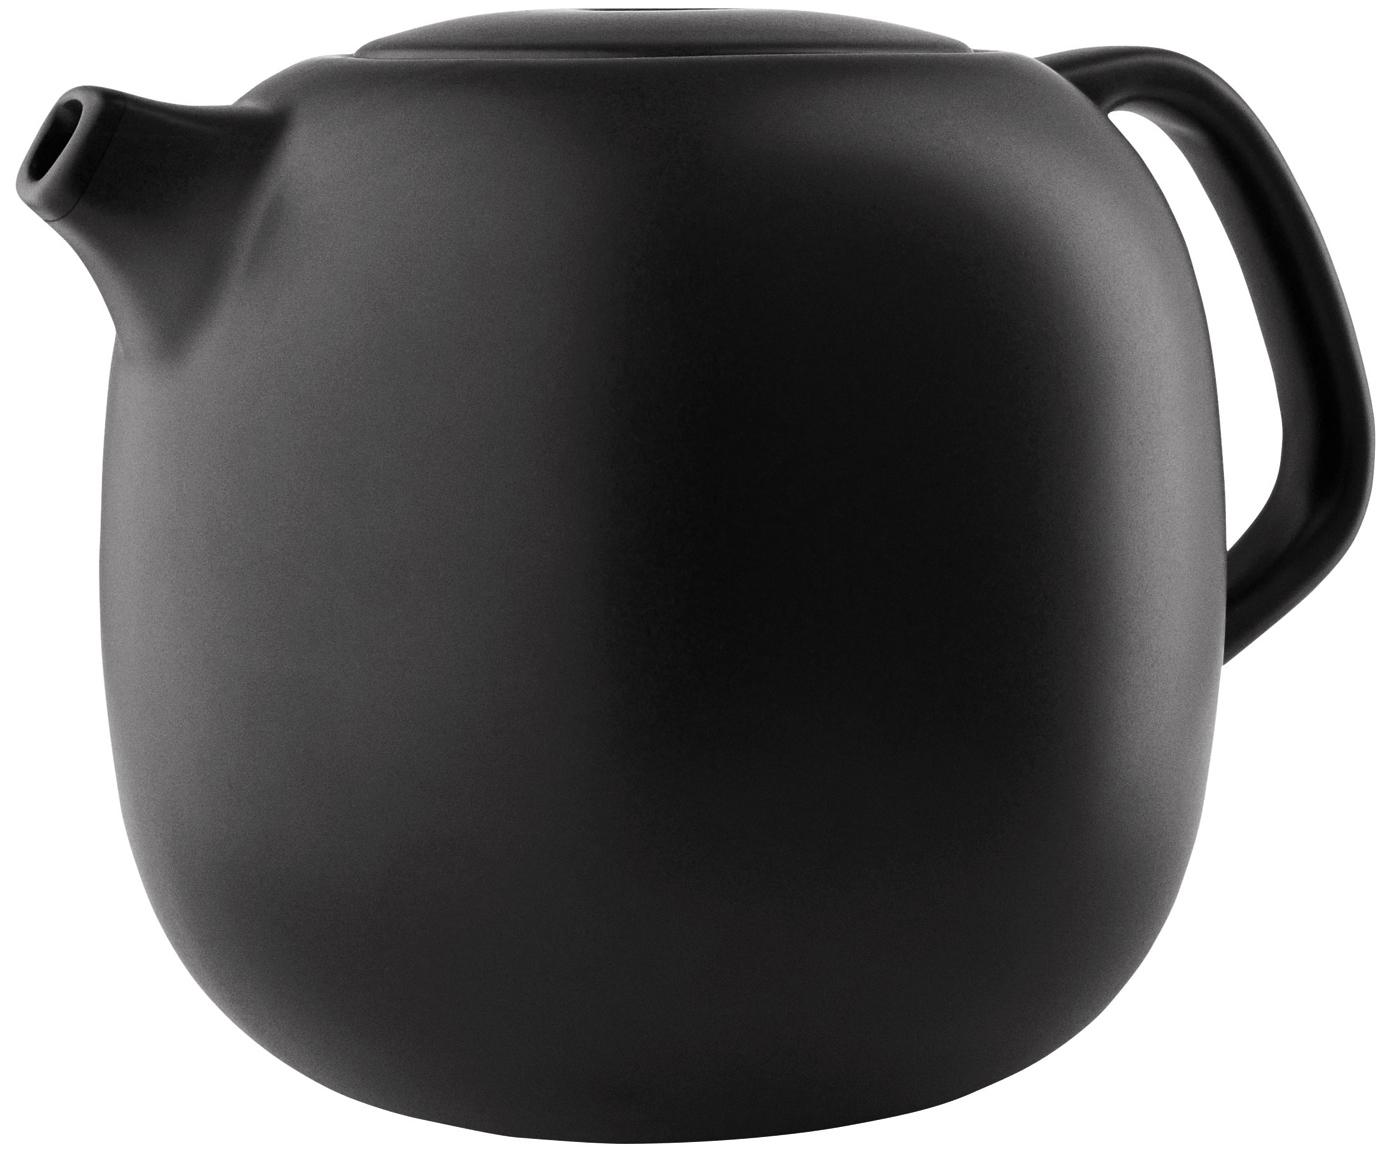 Teiera color nero opaco Nordic Kitchen, Nero opaco, 1 l